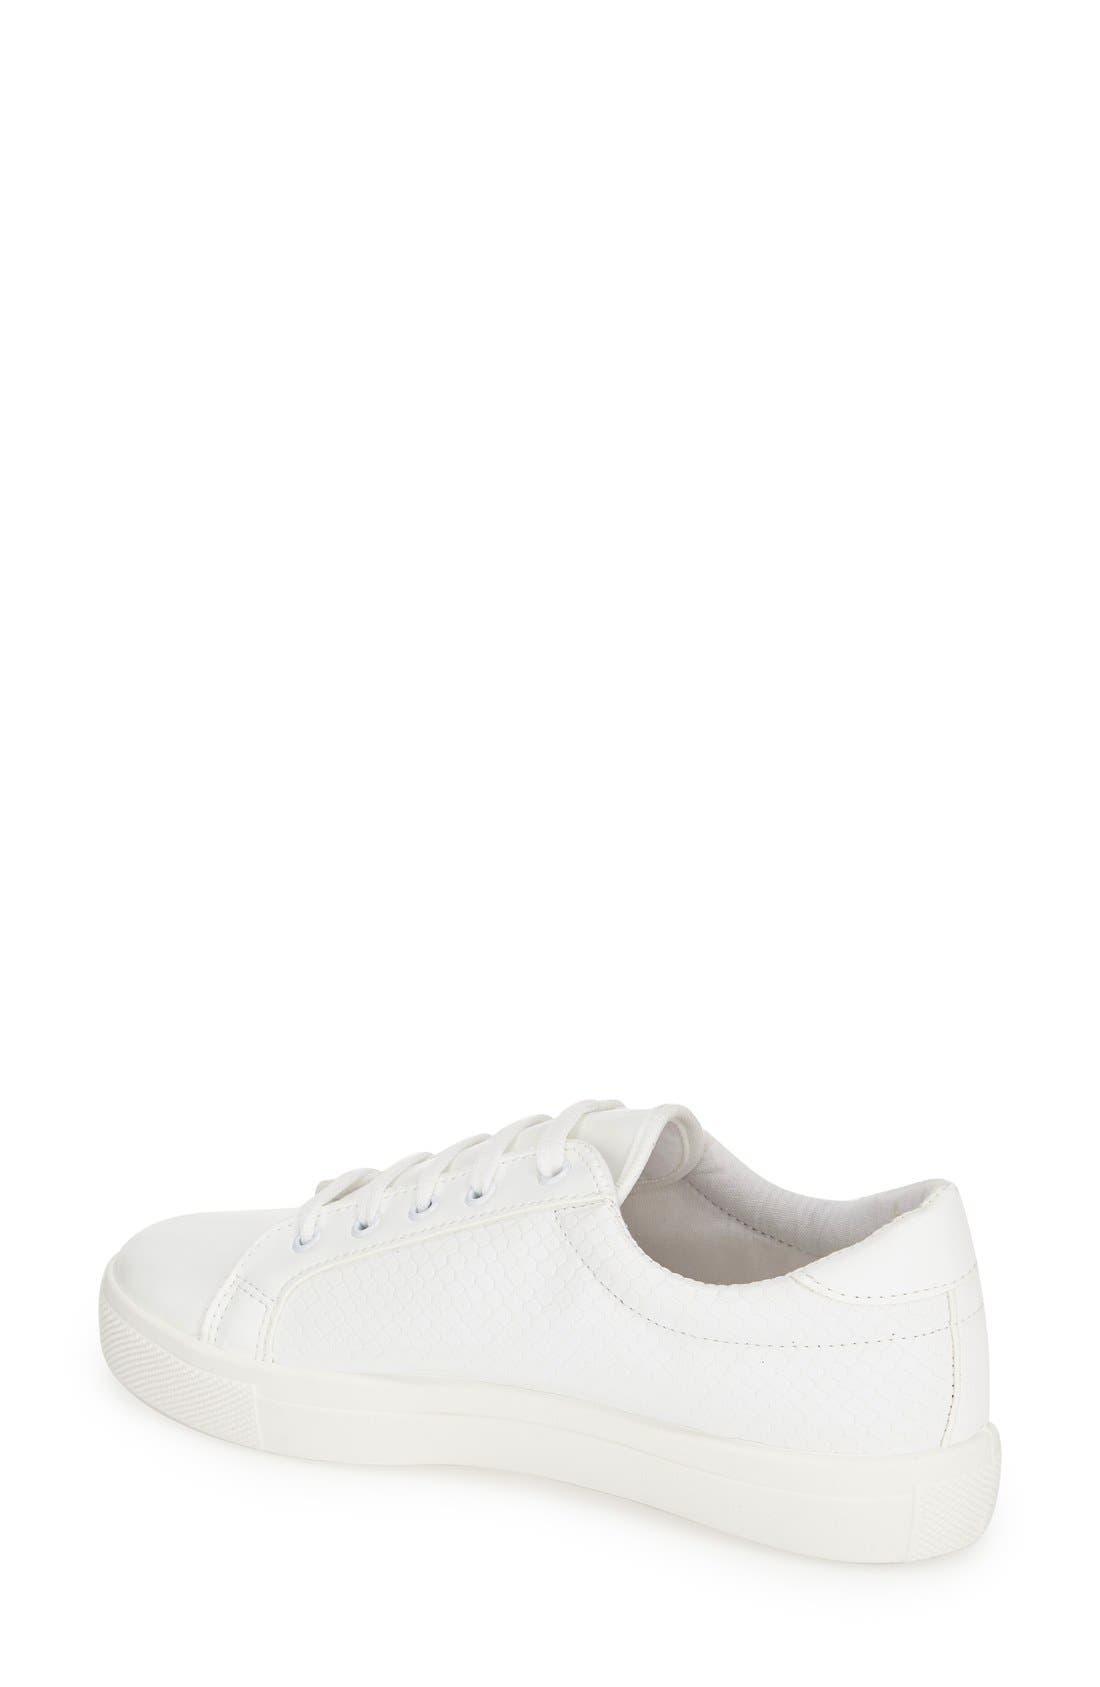 'Copenhagen' Lizard Embossed Faux Leather Sneaker,                             Alternate thumbnail 2, color,                             White